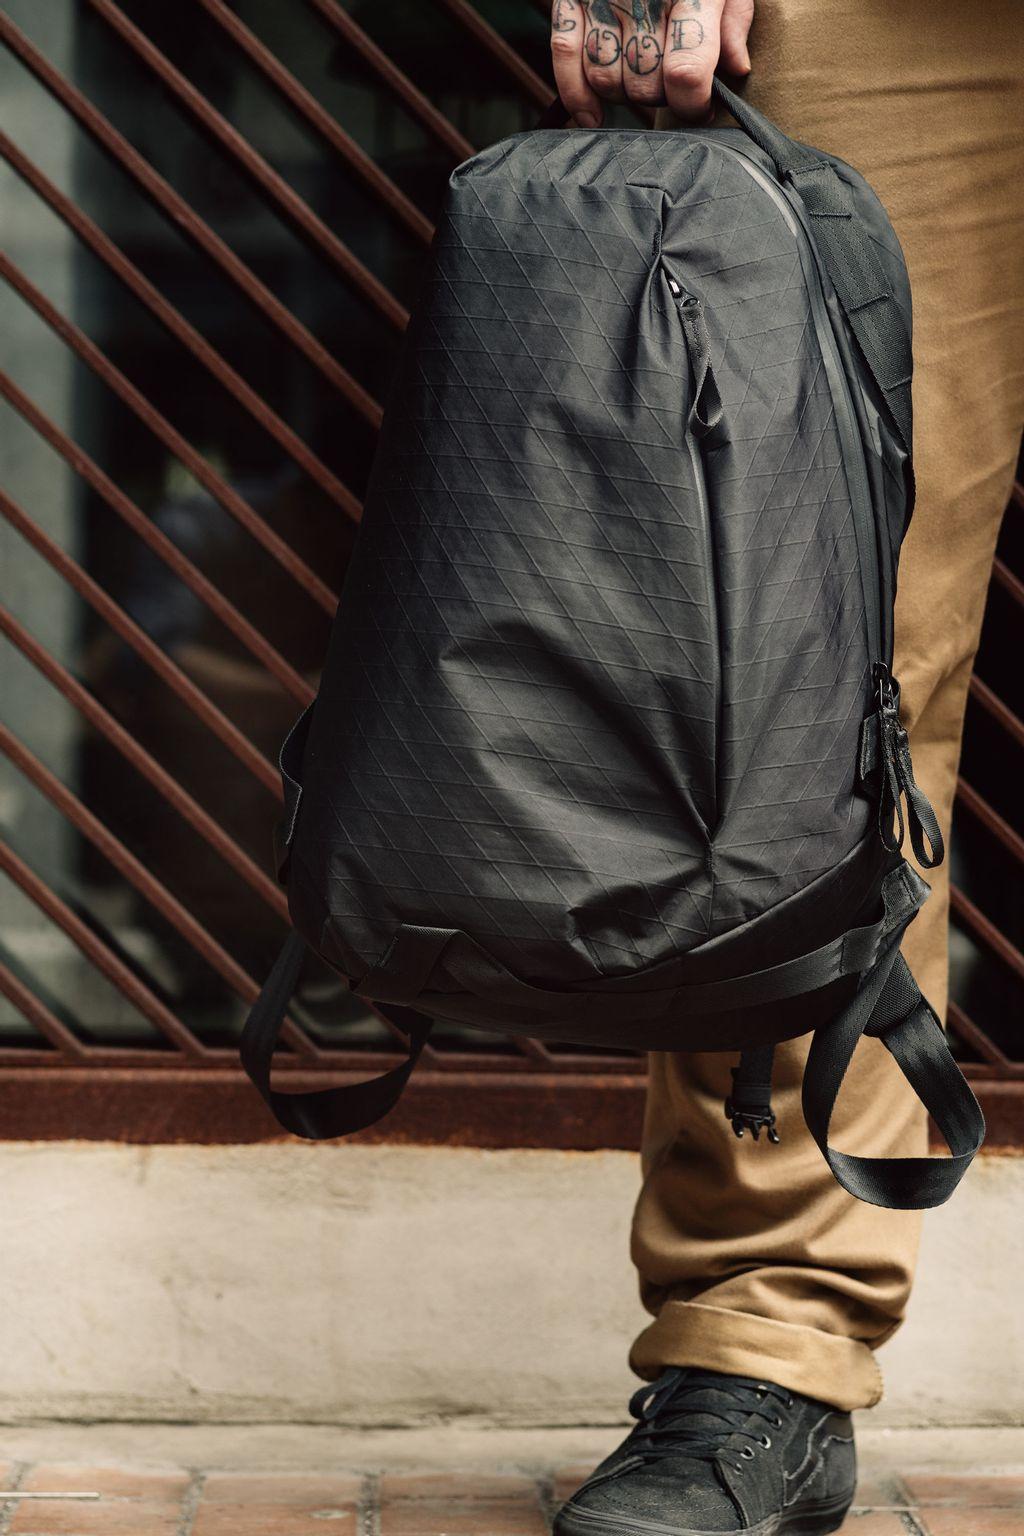 91858101 Daily Backpack - XPAC Black Lifestyle 8.jpg